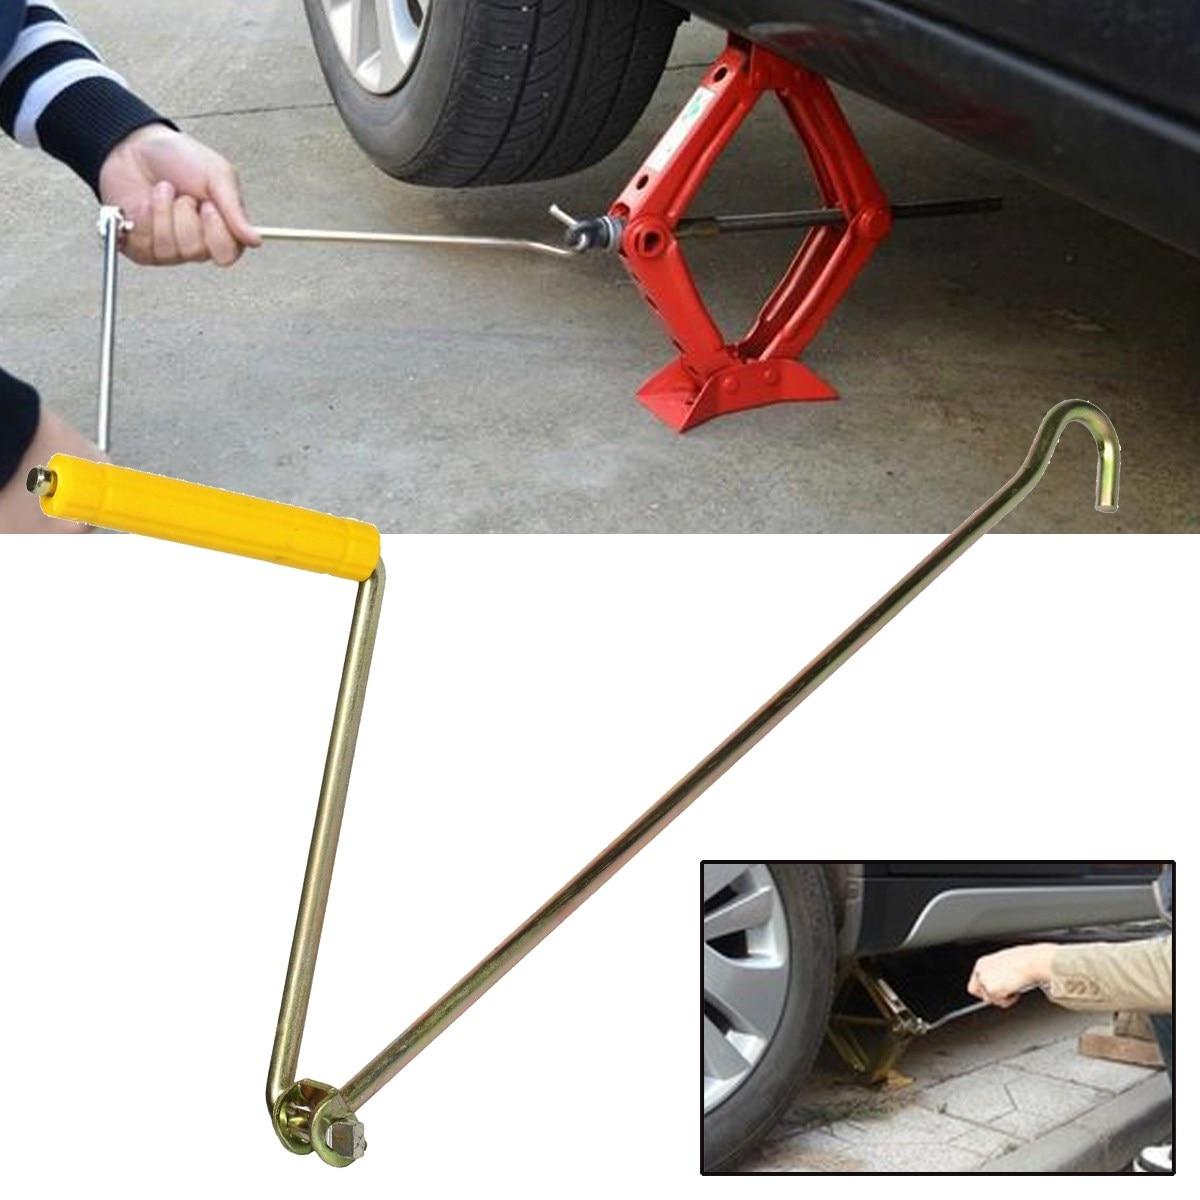 1Pcs Car Jacks Tire Wheel Lug Wrench Tool Crank Scissor Speed Handle Yellow Metal Steel  ...